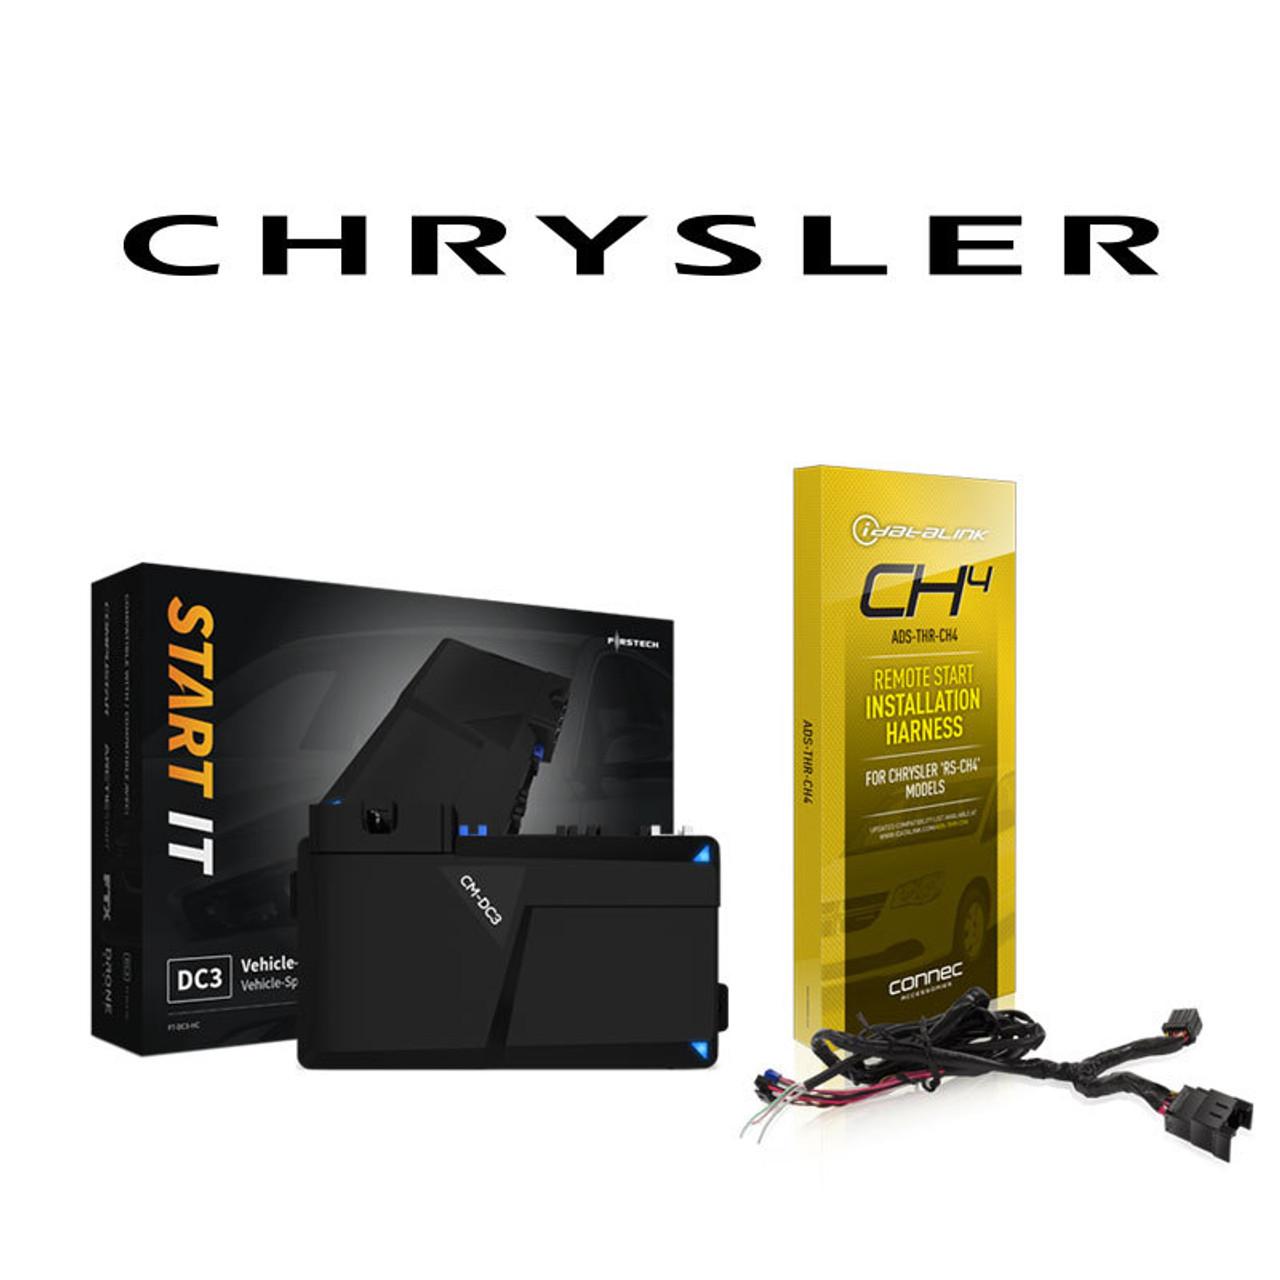 Chrysler Remote Start System